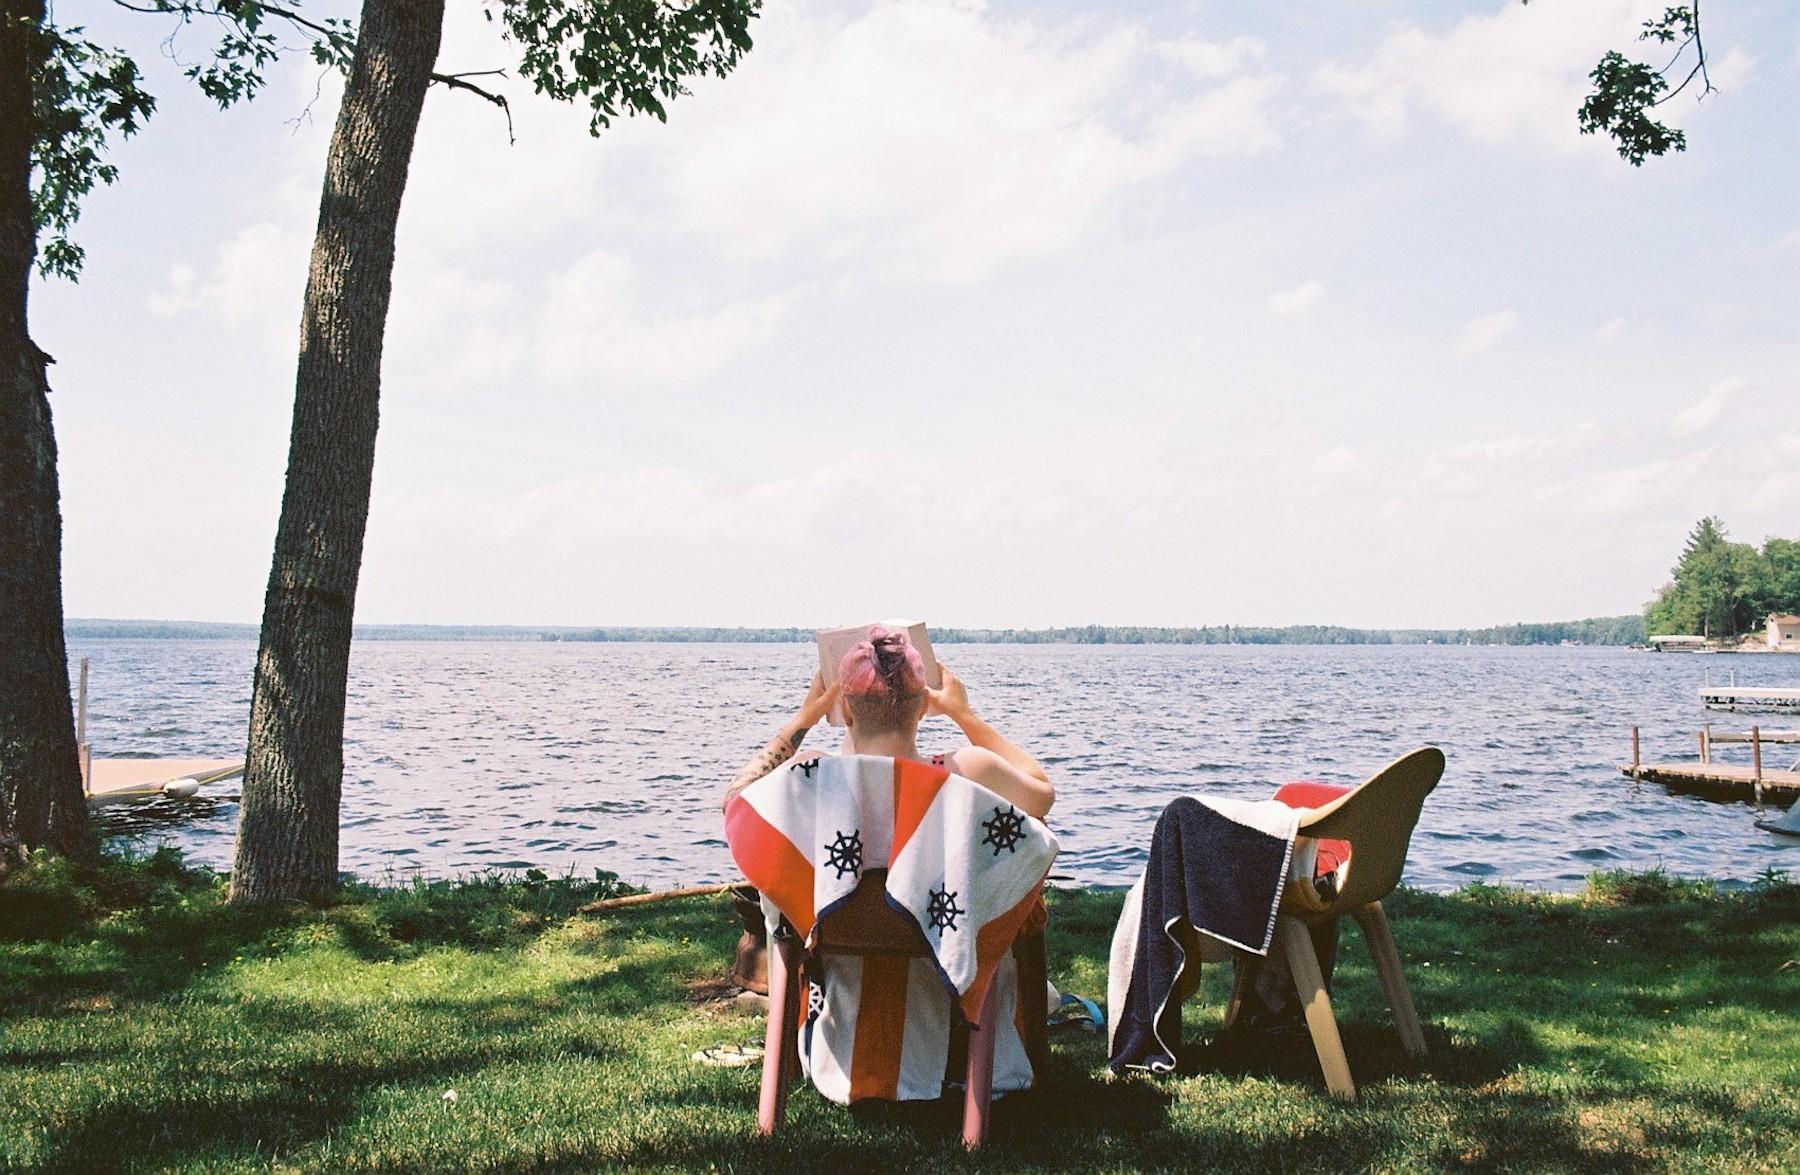 Karen Freer | Lake and Chill | Pentax ME Super